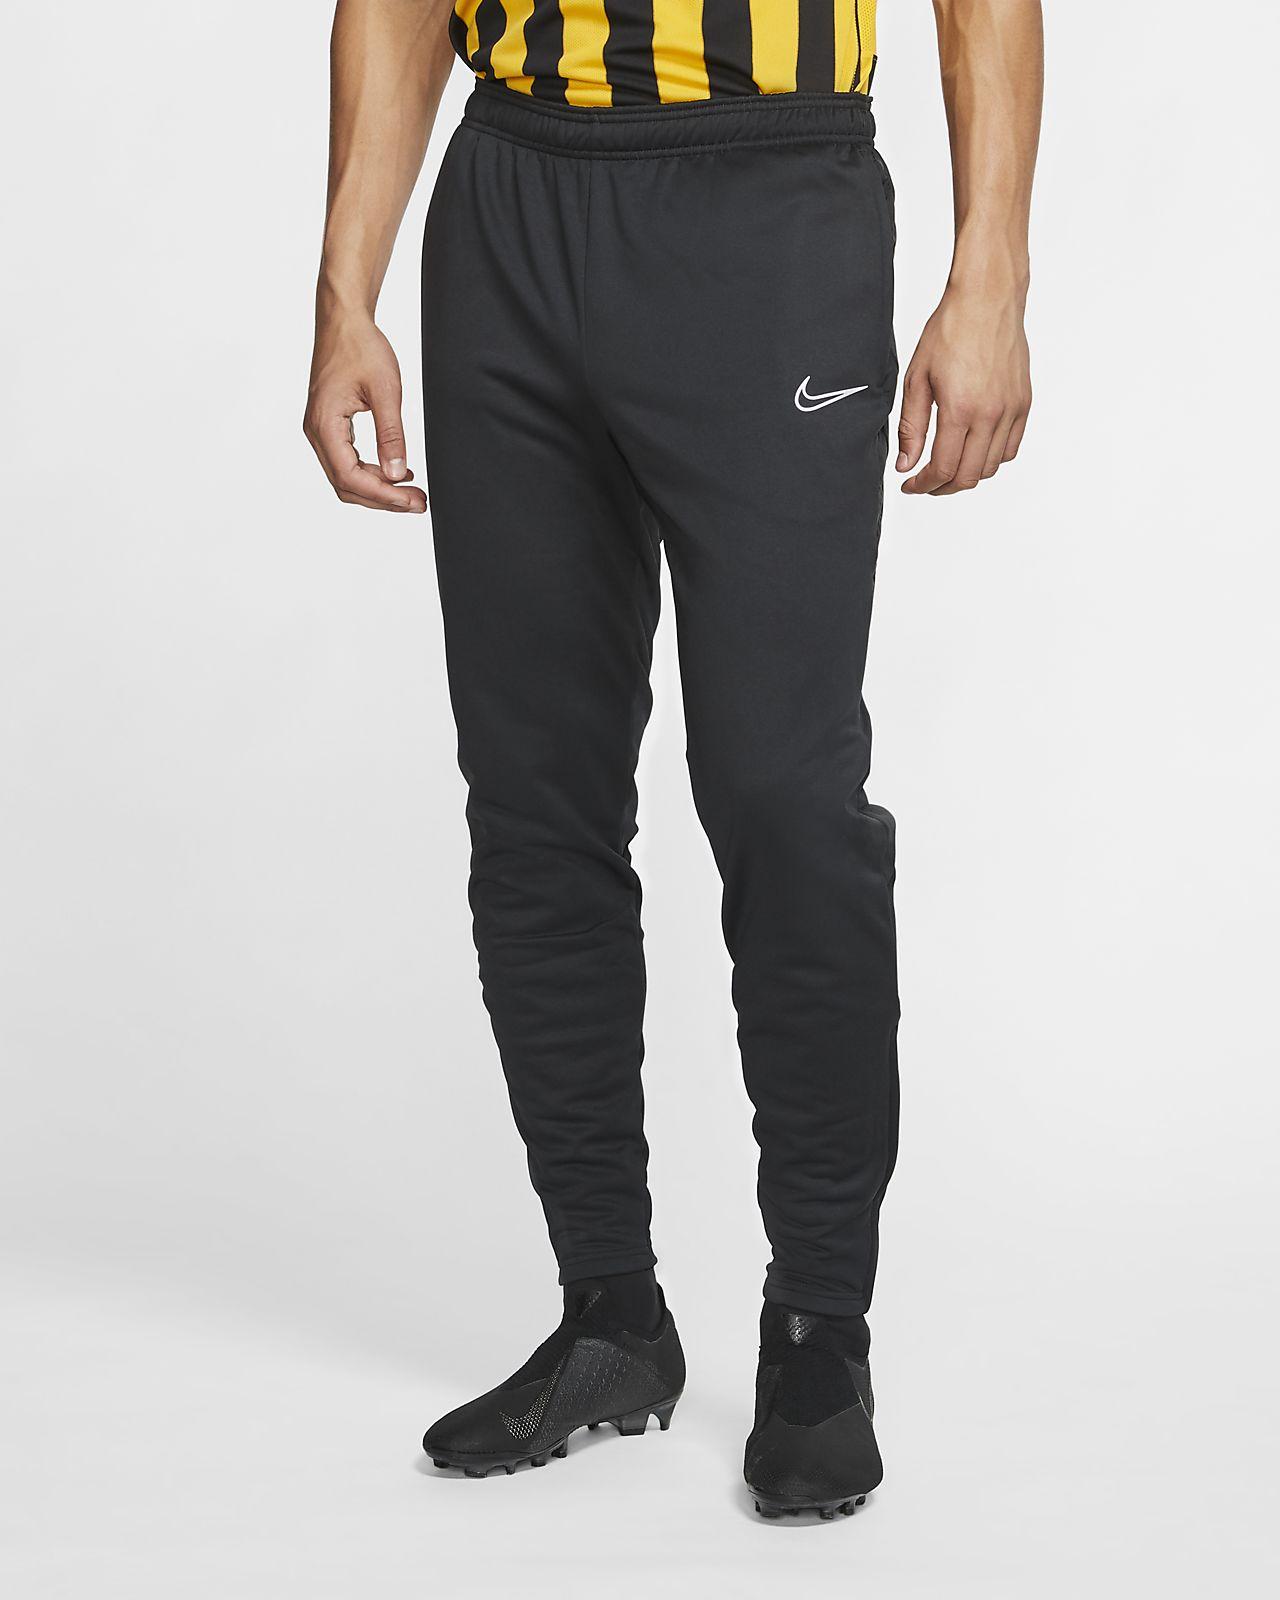 Pantalon de football Nike Therma Academy pour Homme